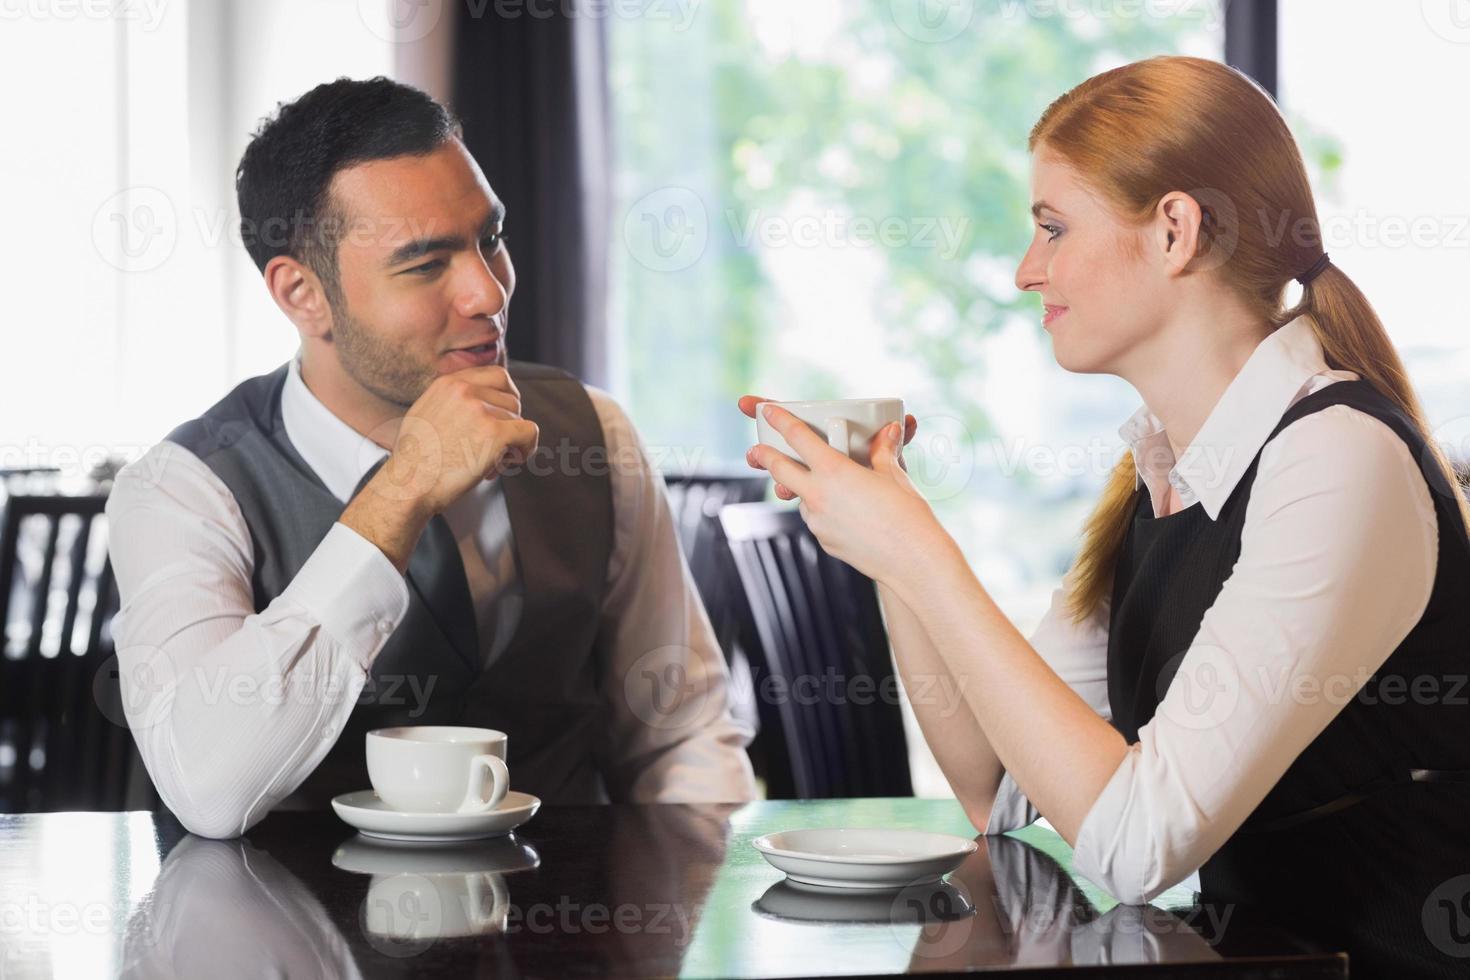 uomini d'affari a parlare davanti al caffè foto